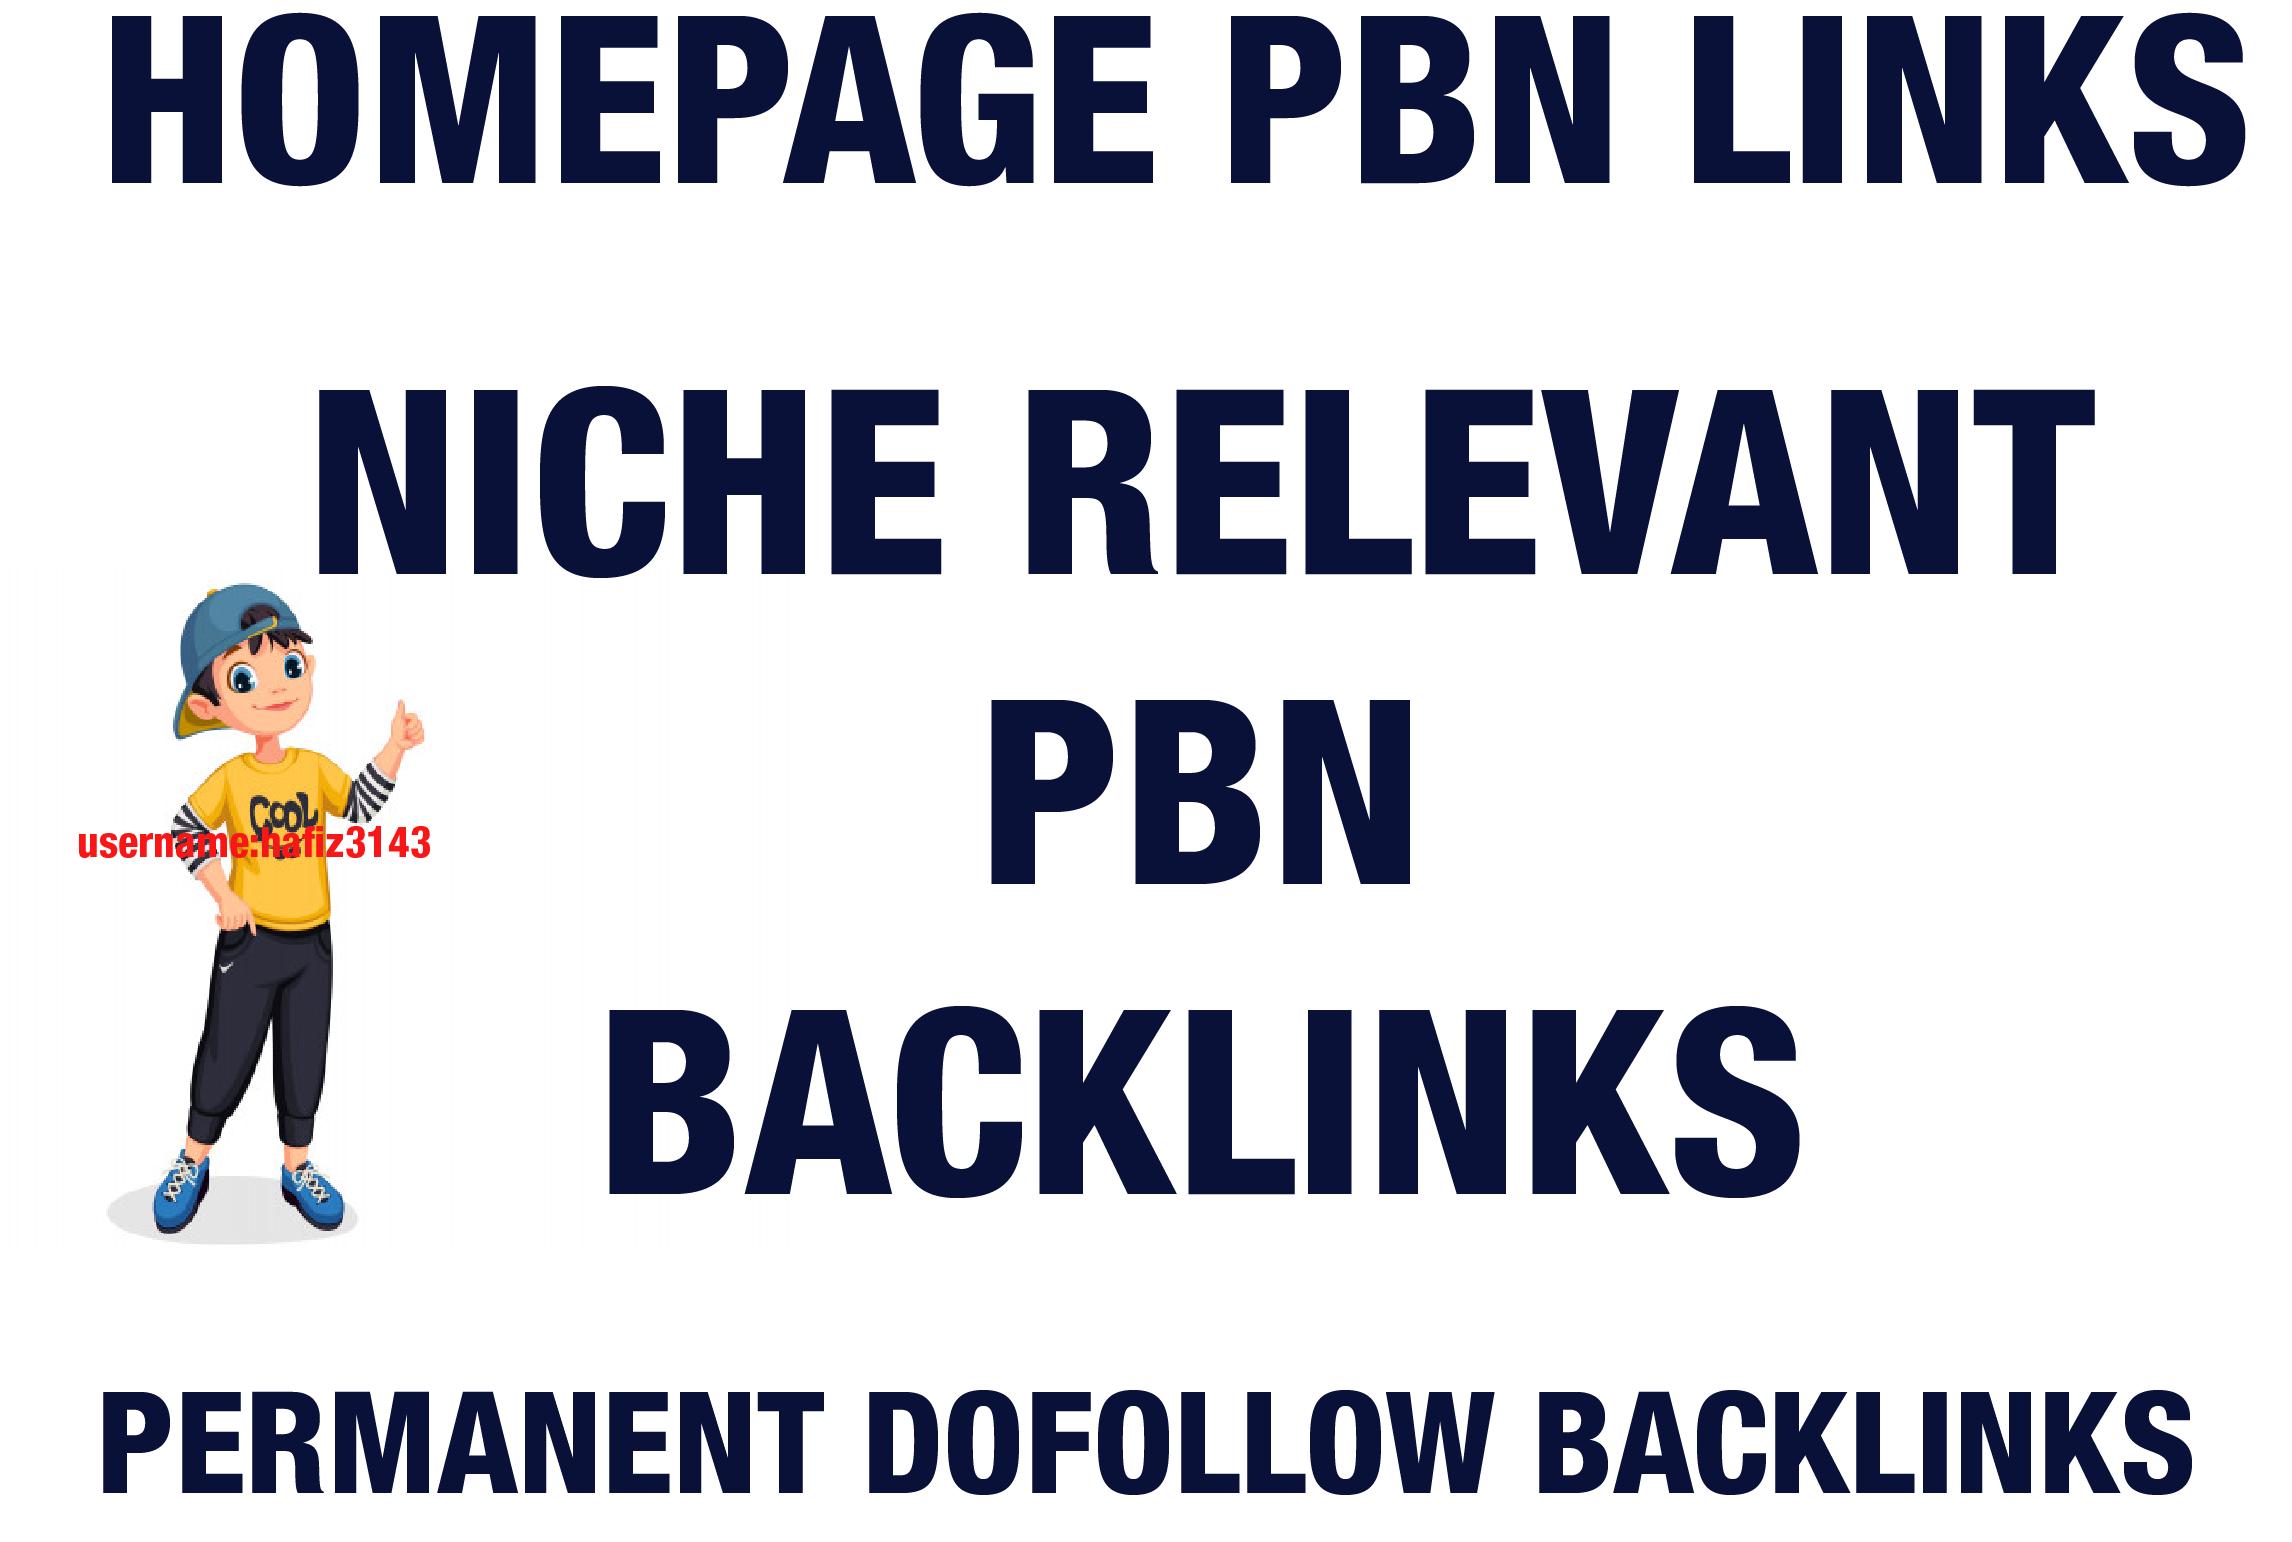 I will Provide 10 Niche Relevant Niche Edits PBN Backlinks